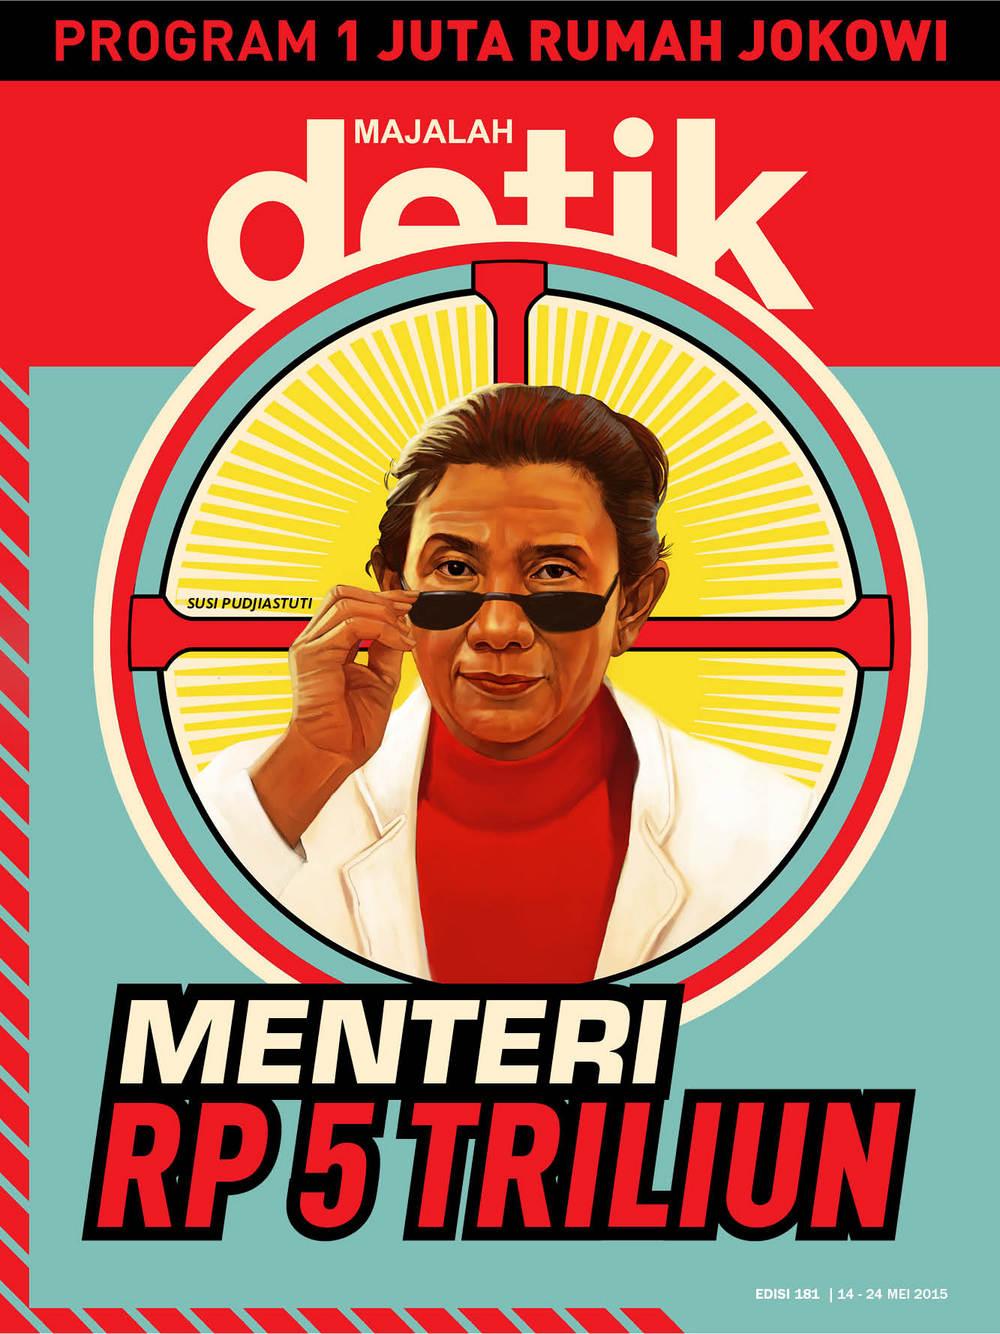 Menteri Rp 5 Triliun